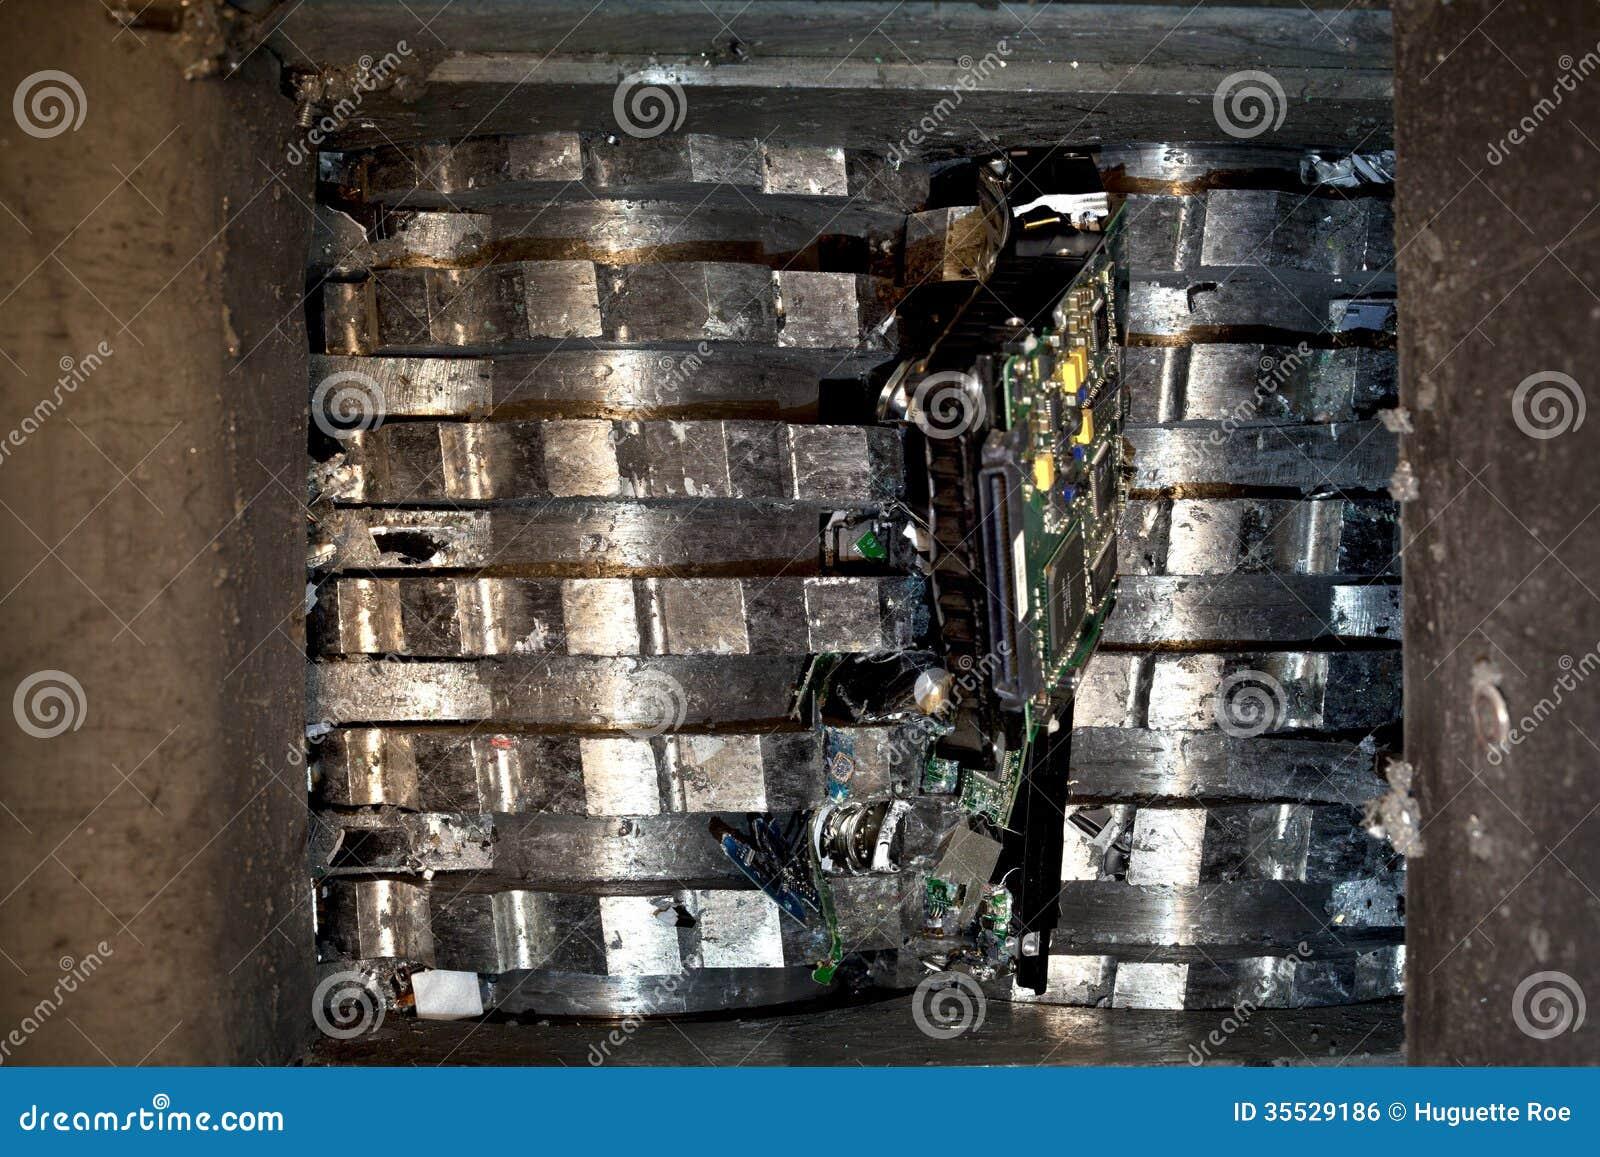 La Magia De Reciclar additionally Sku K 7698 further Dual shear m55 as well Upstateshredding moreover Howwerecycle. on scrap metal shredding